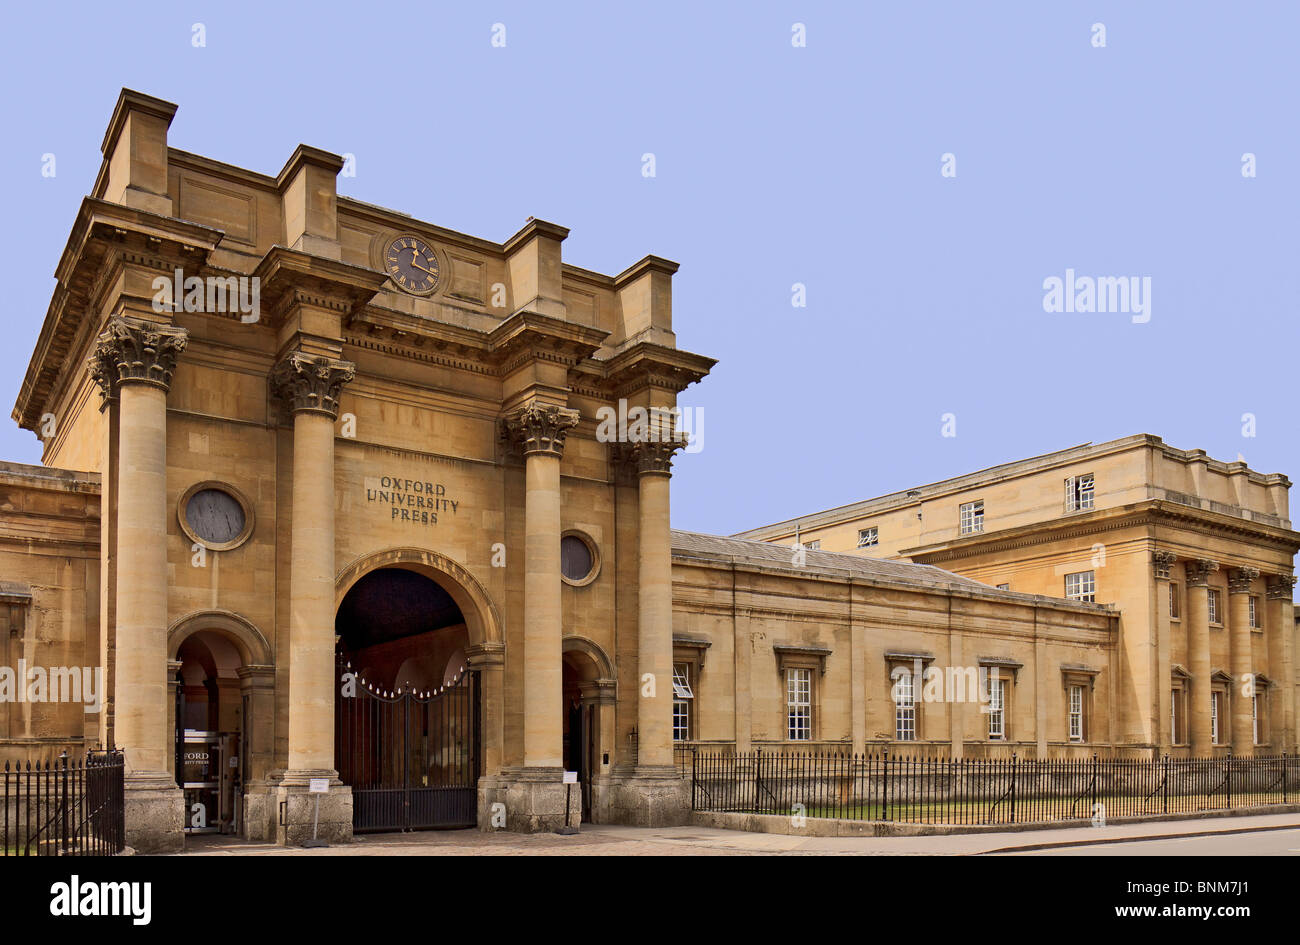 UK Oxford University Press Building Stock Photo: 30563177